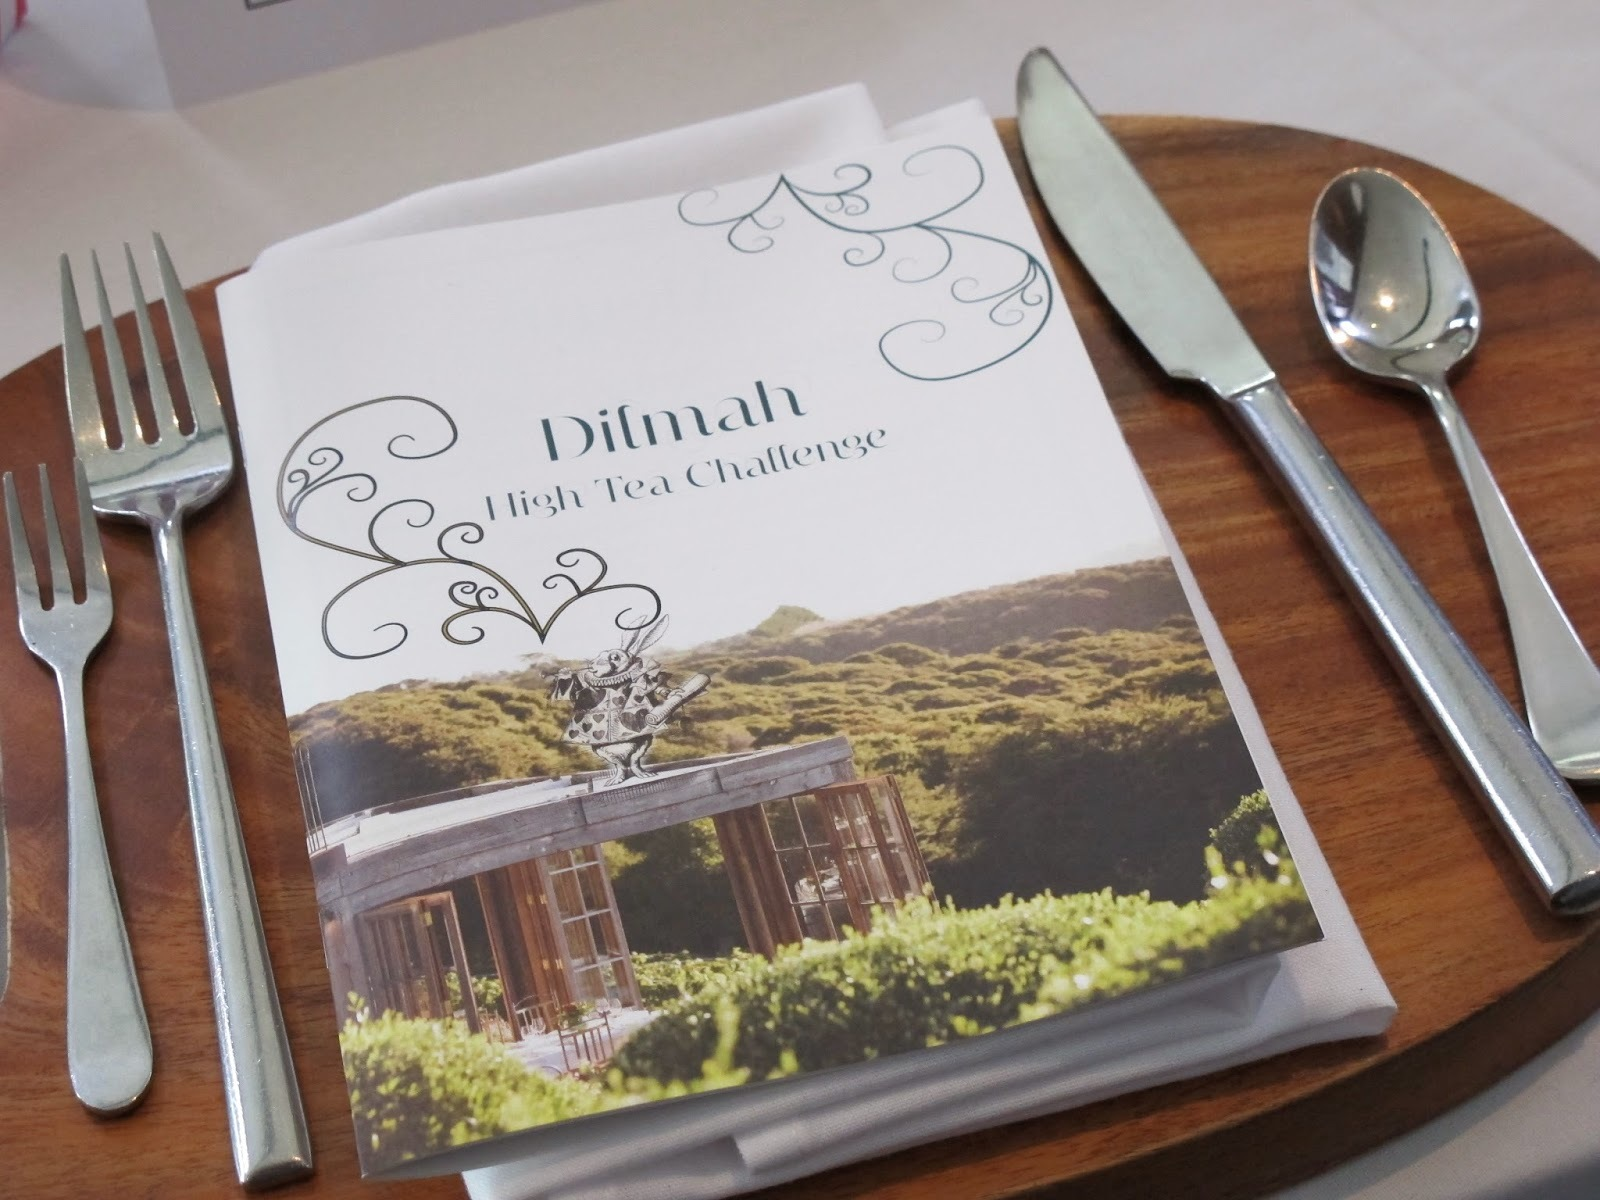 The Dilmah Real High Tea Challenge 2014